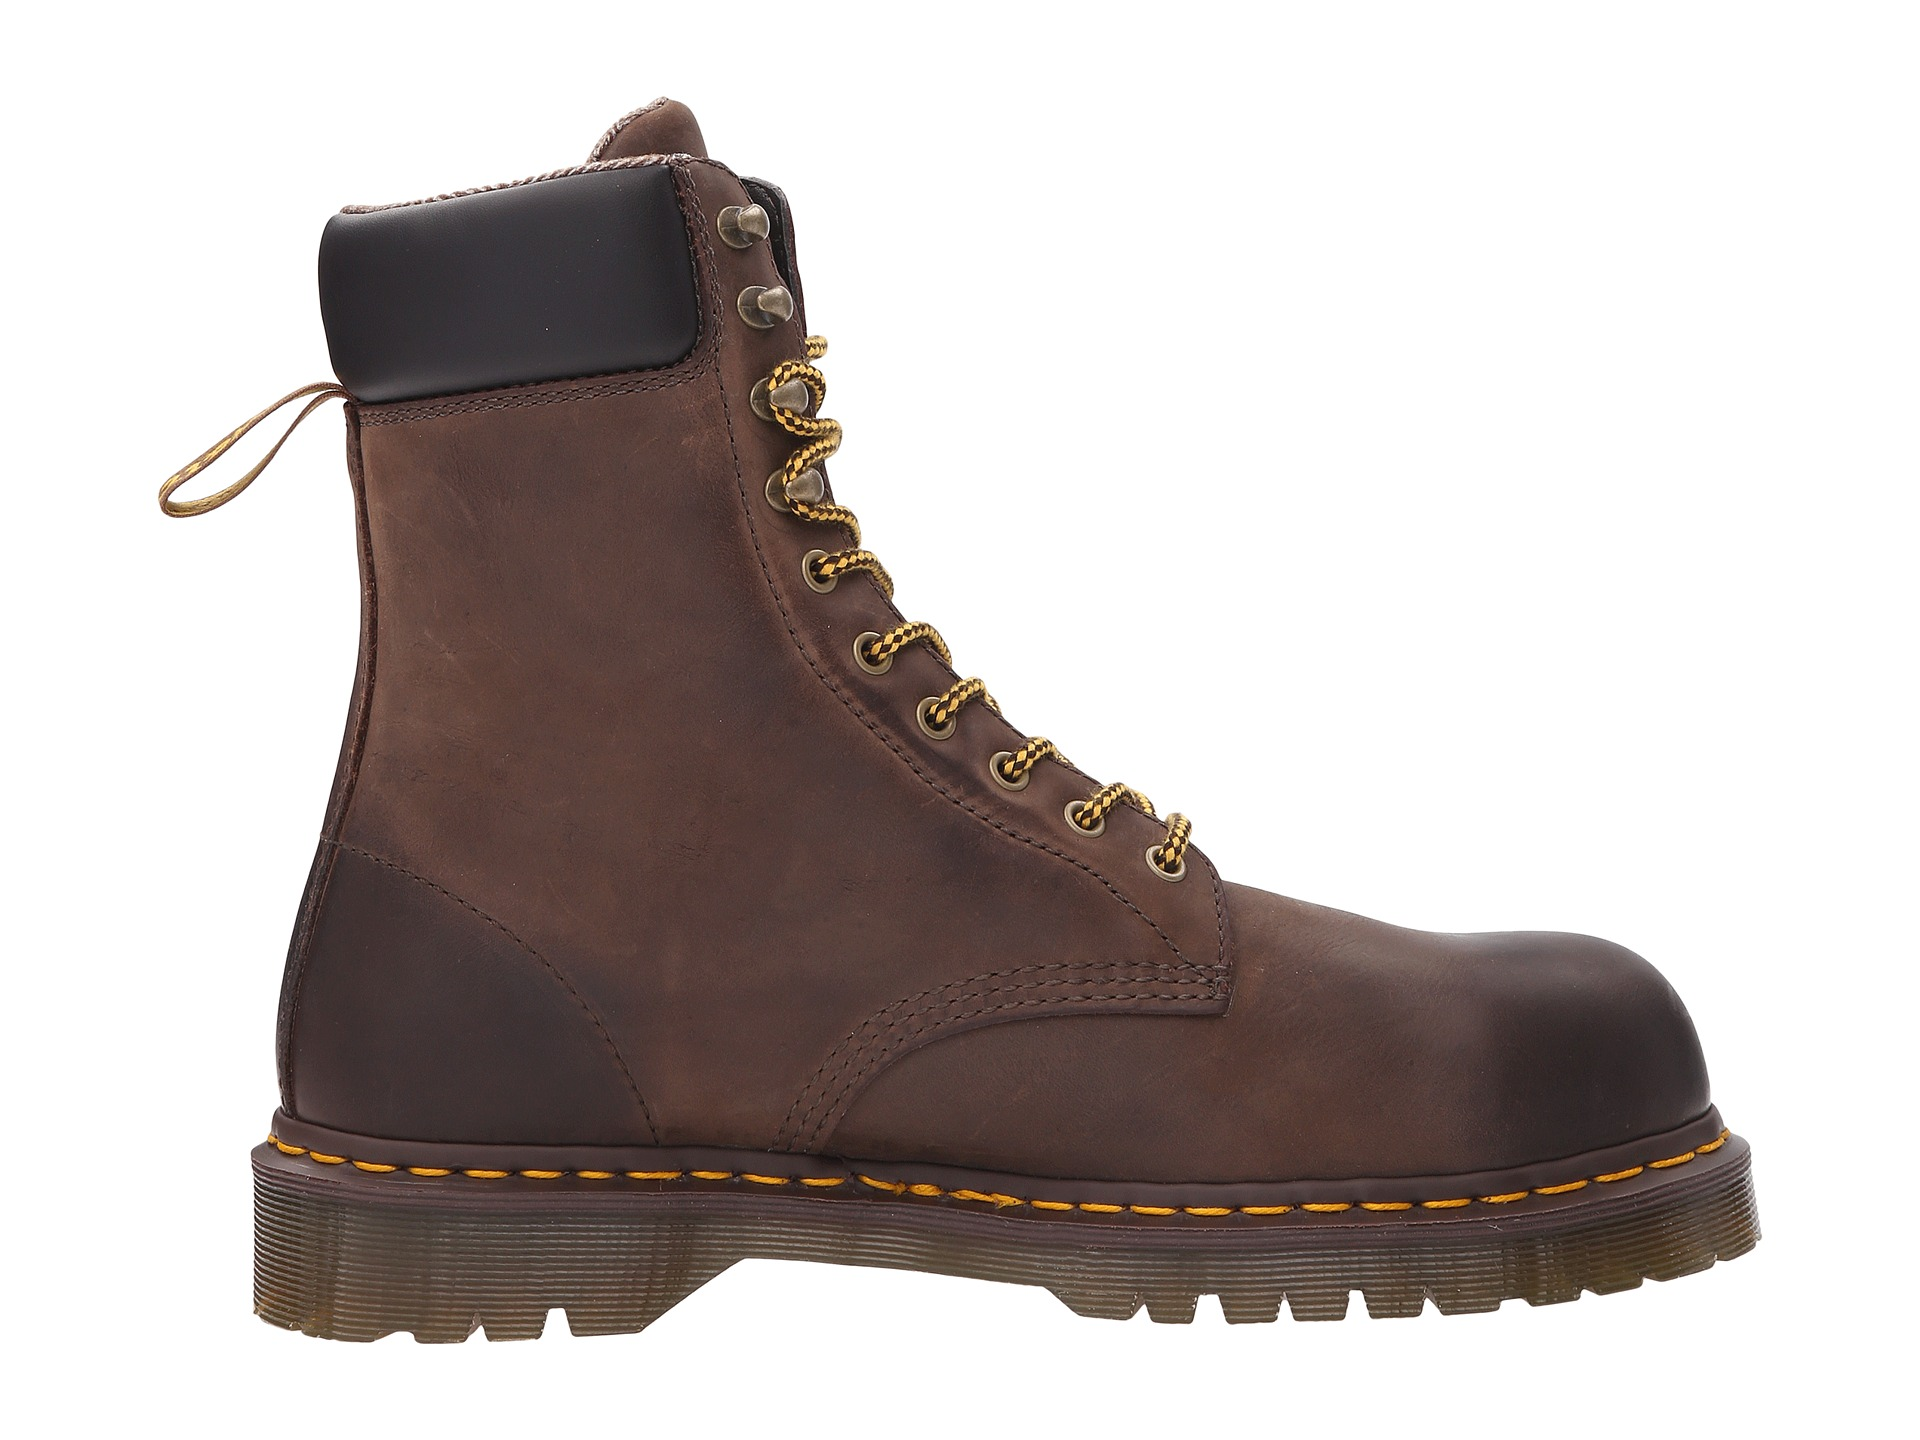 Fashionable steel toe work boots 96